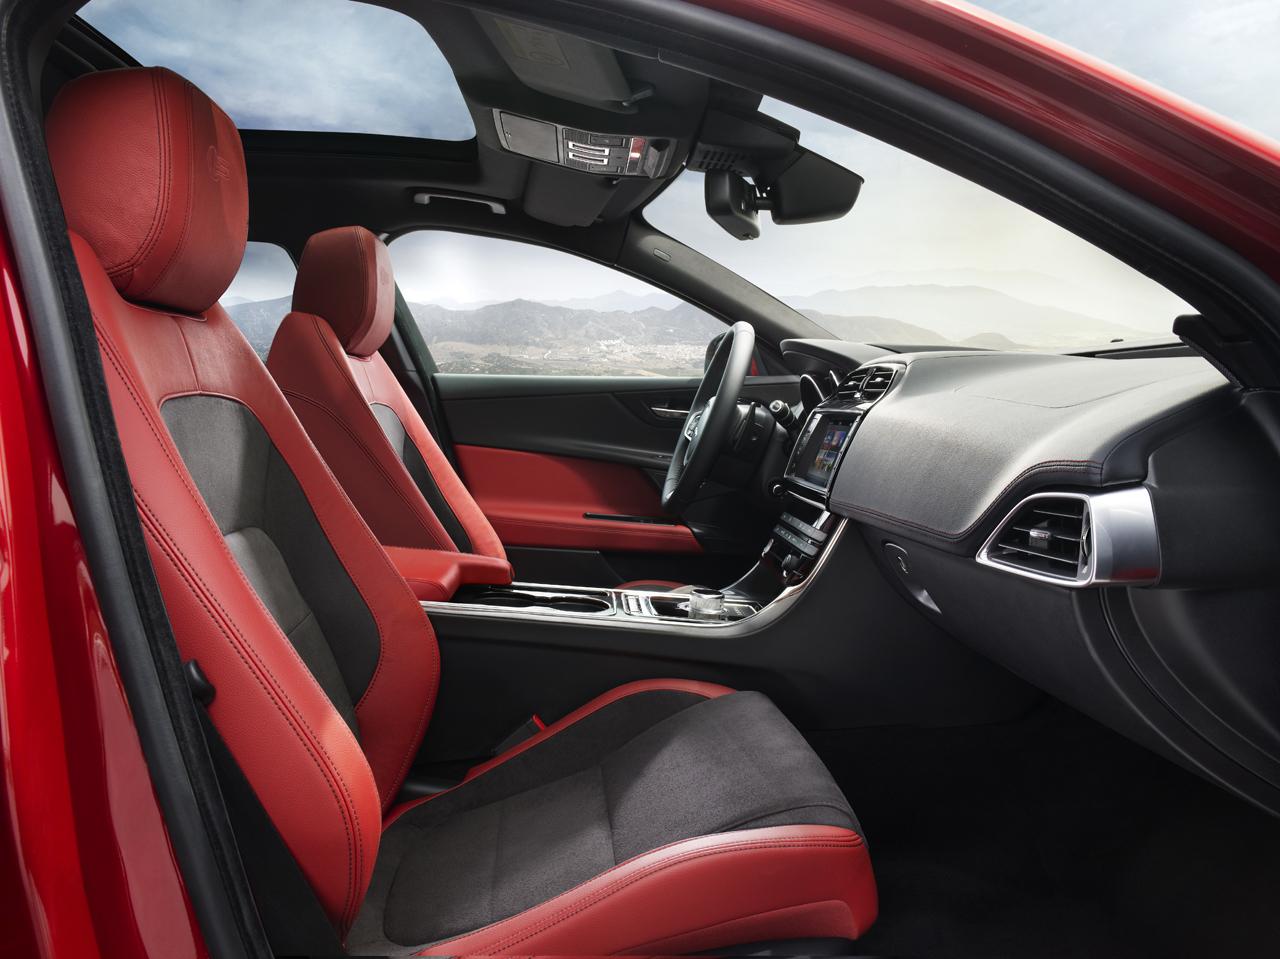 2016-jaguar-xe-13-1 - Copy.jpg